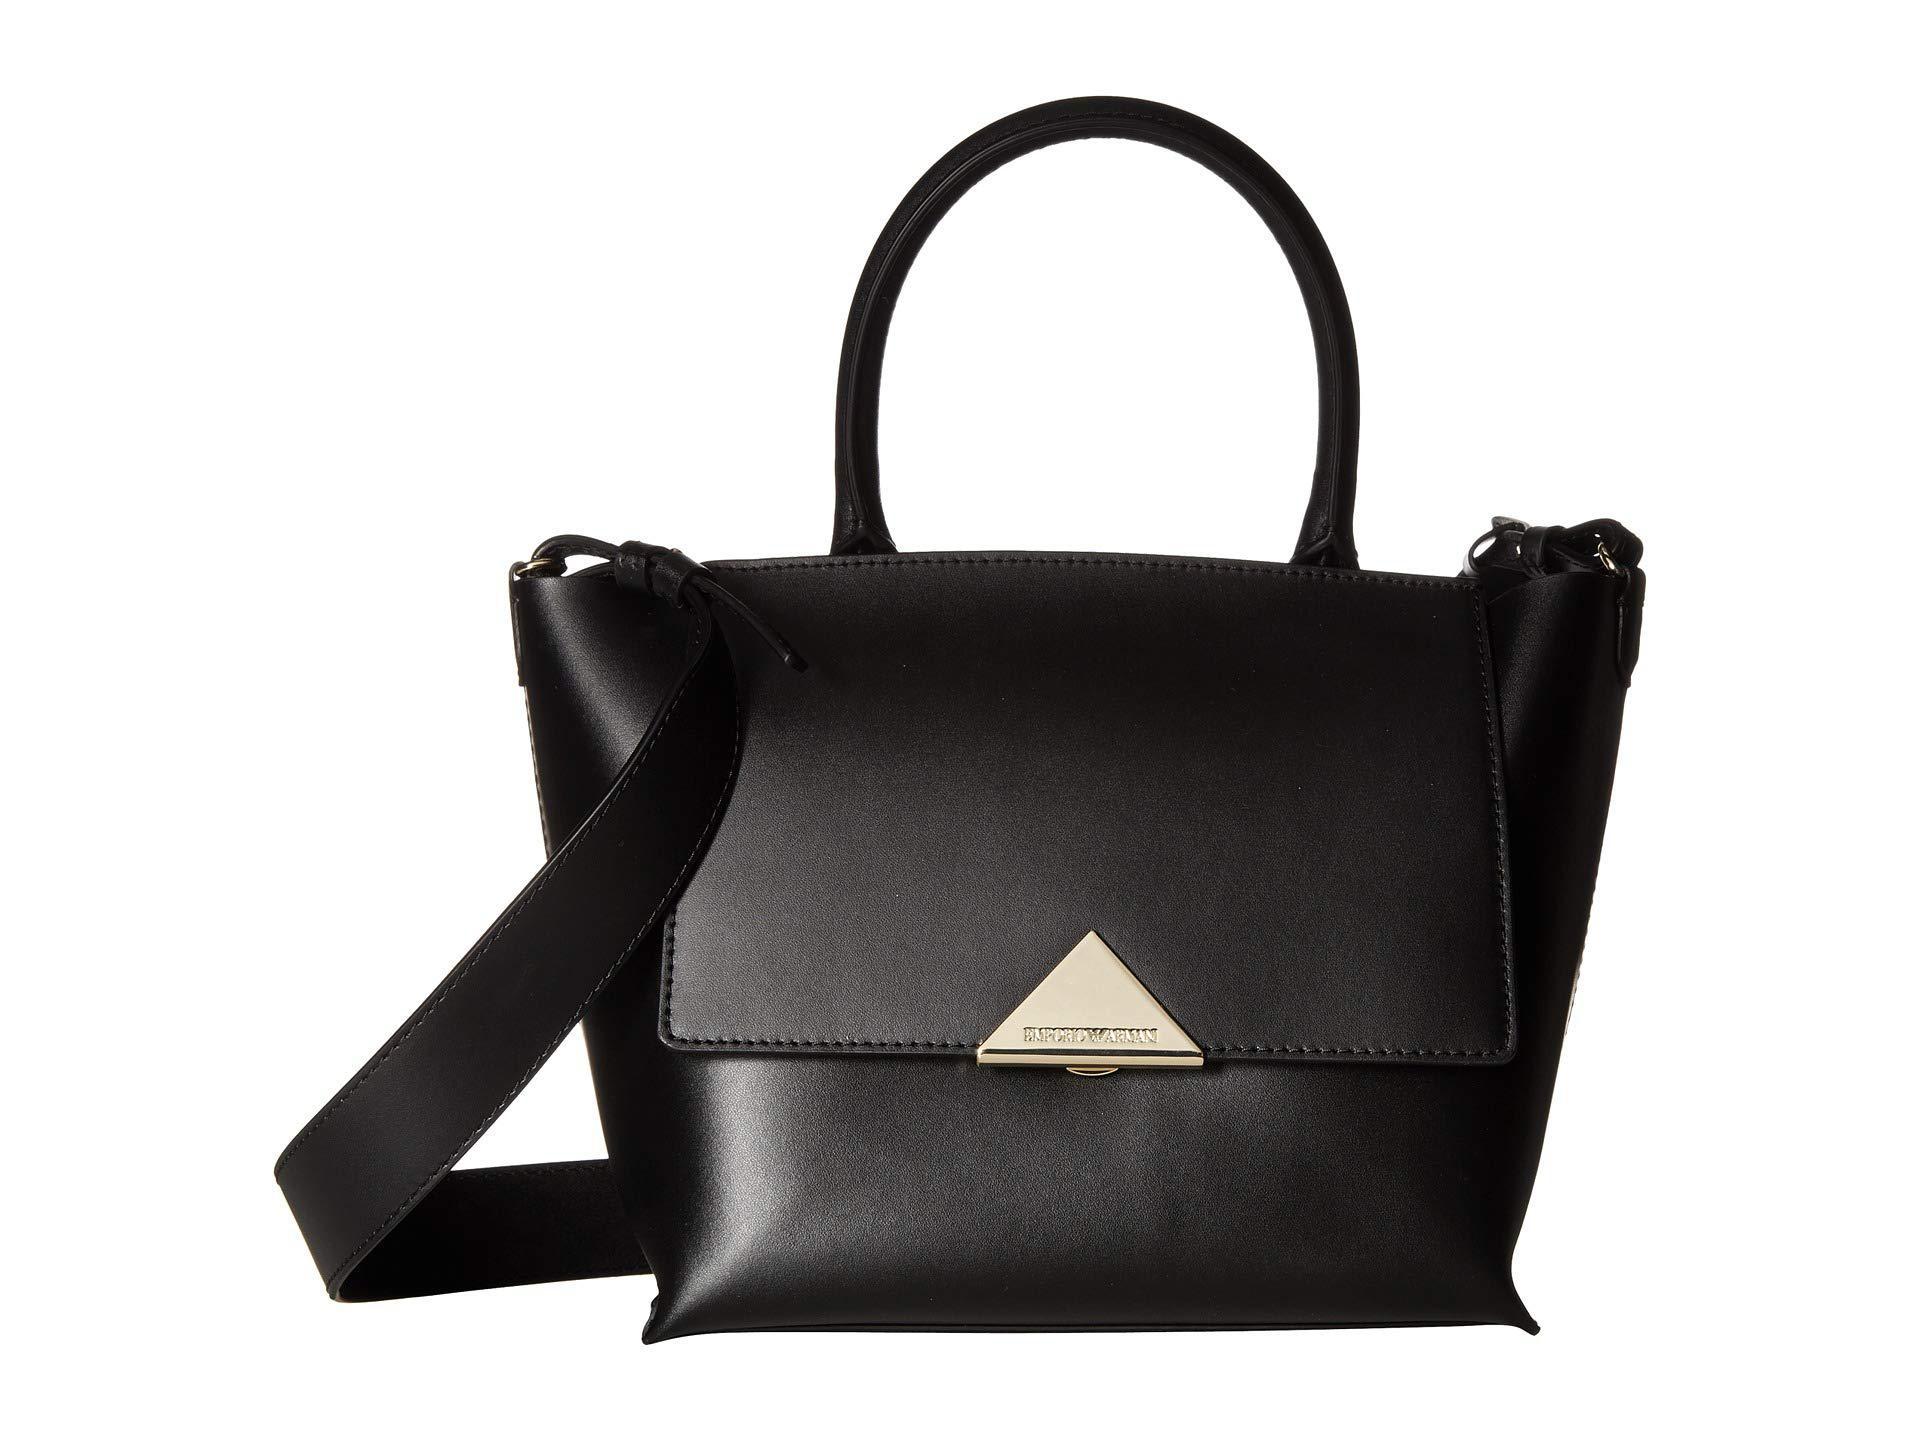 Emporio Armani Women S Faux Leather Handbag